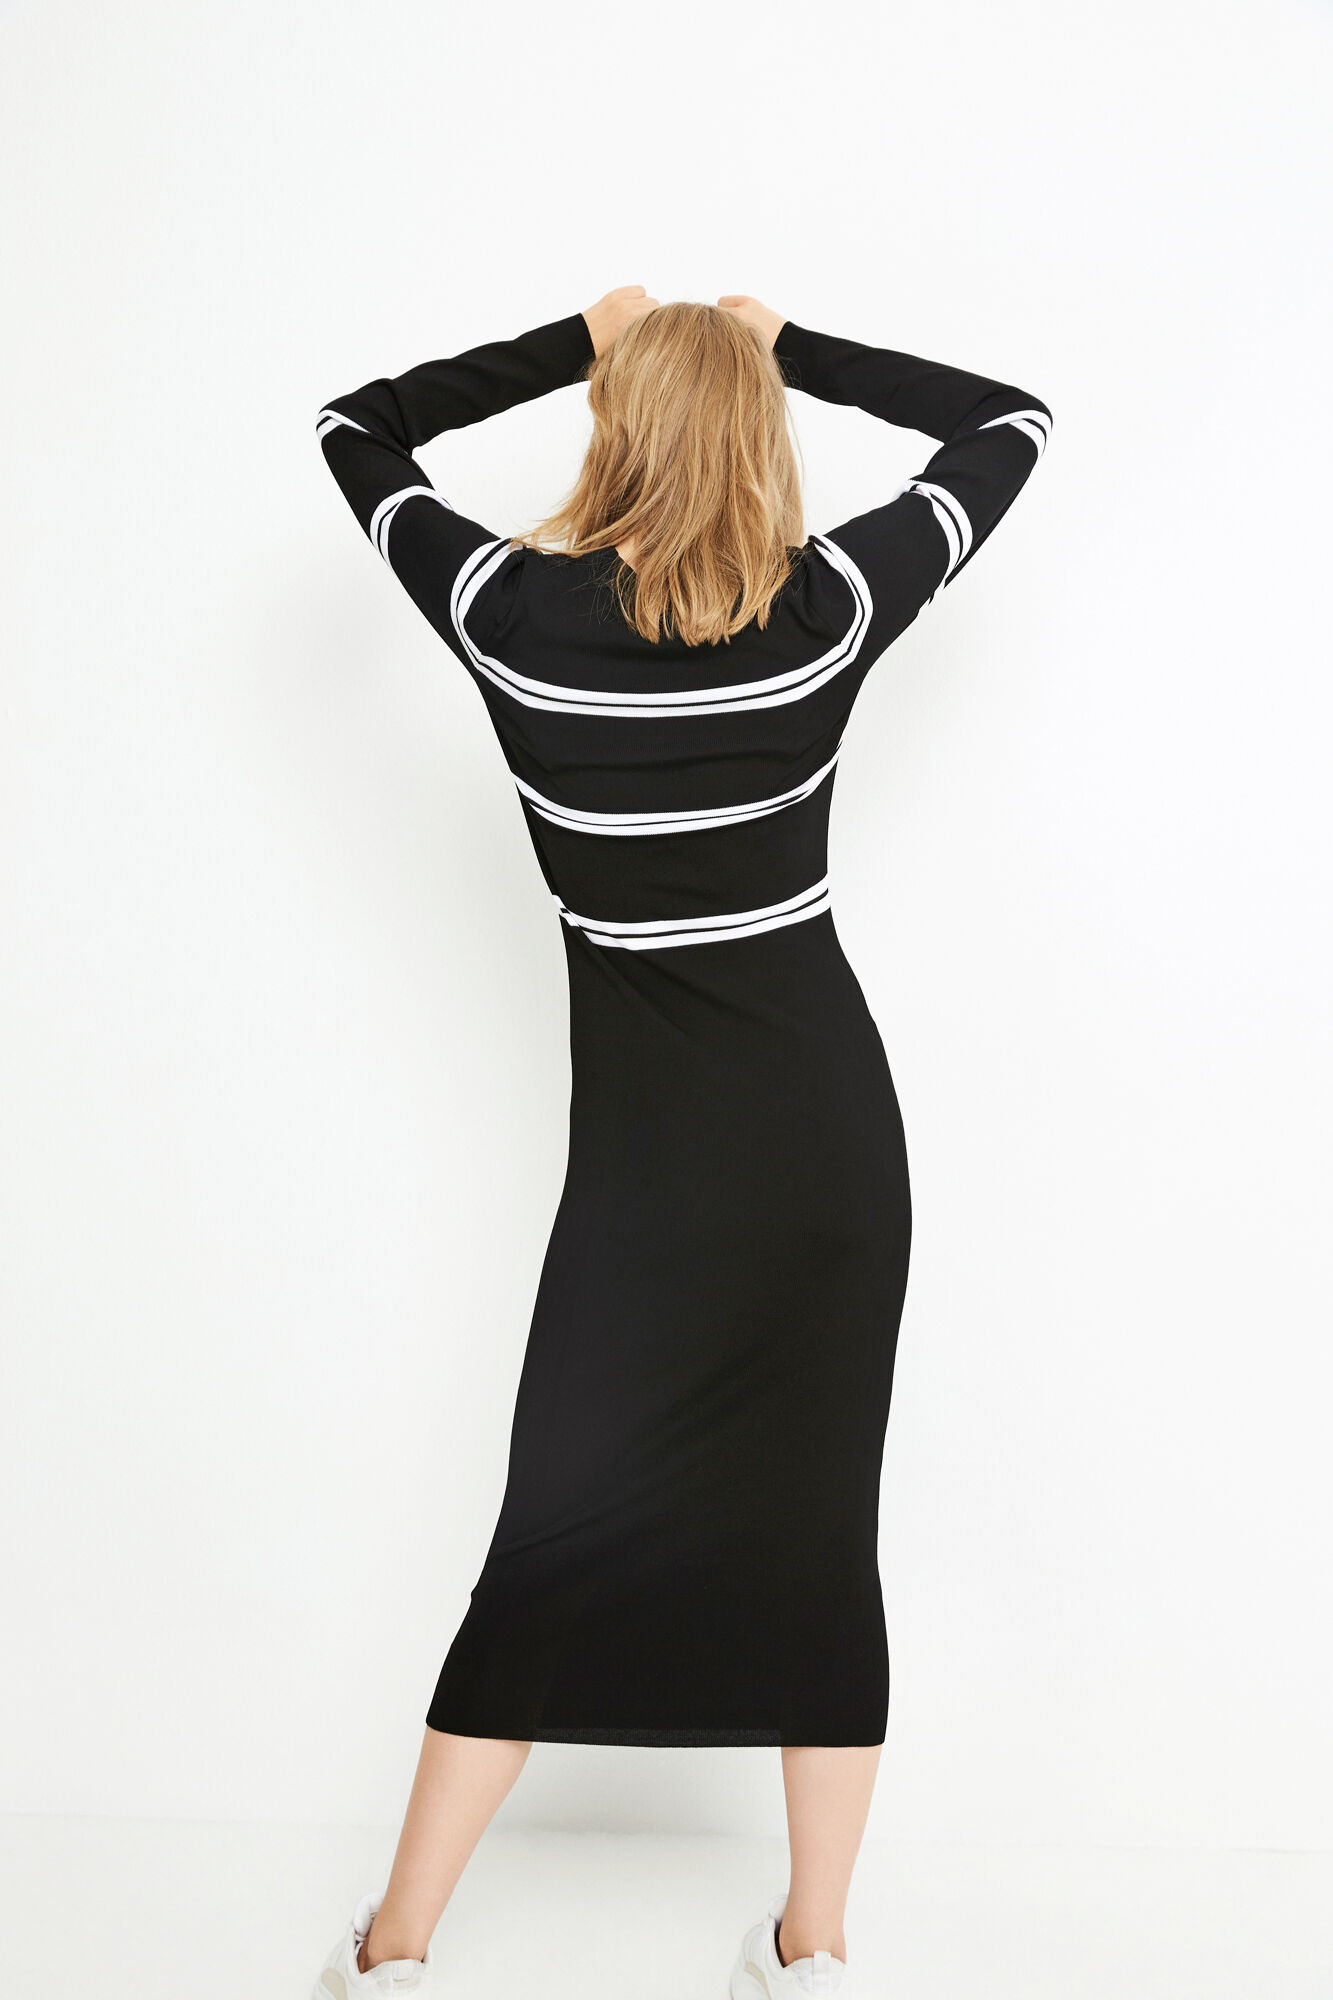 ENSPRINKLE LS DRESS 5180